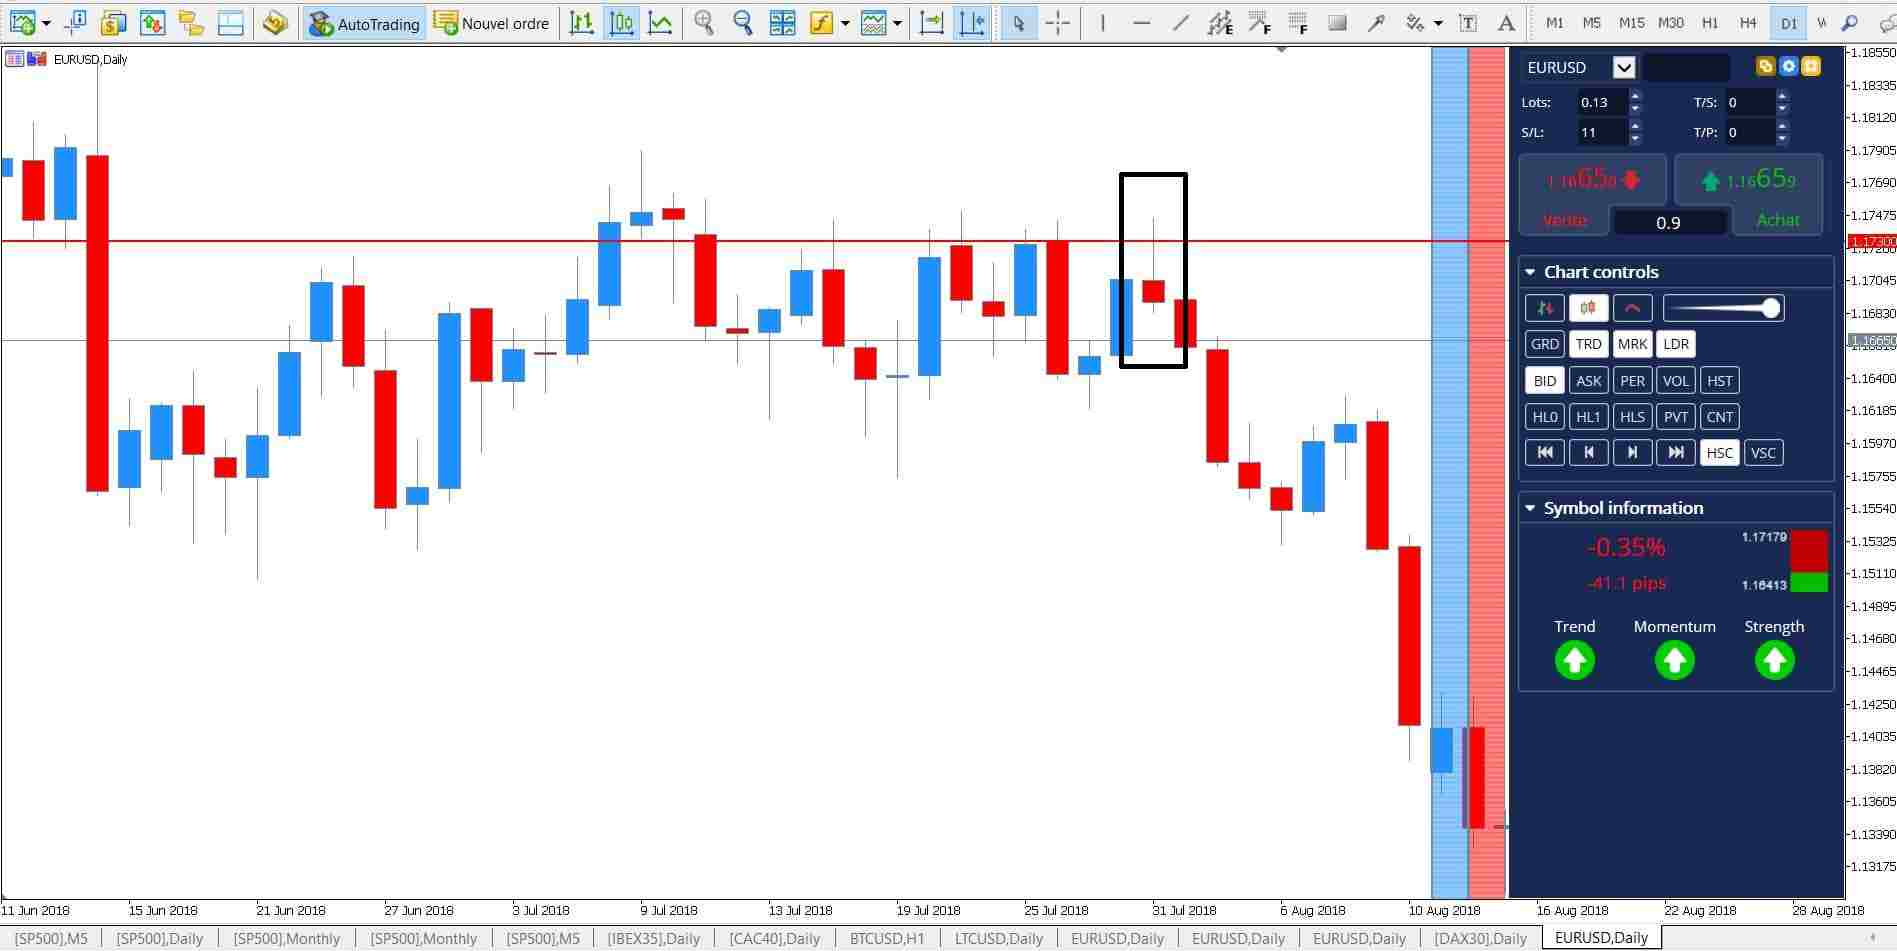 eurusd price action